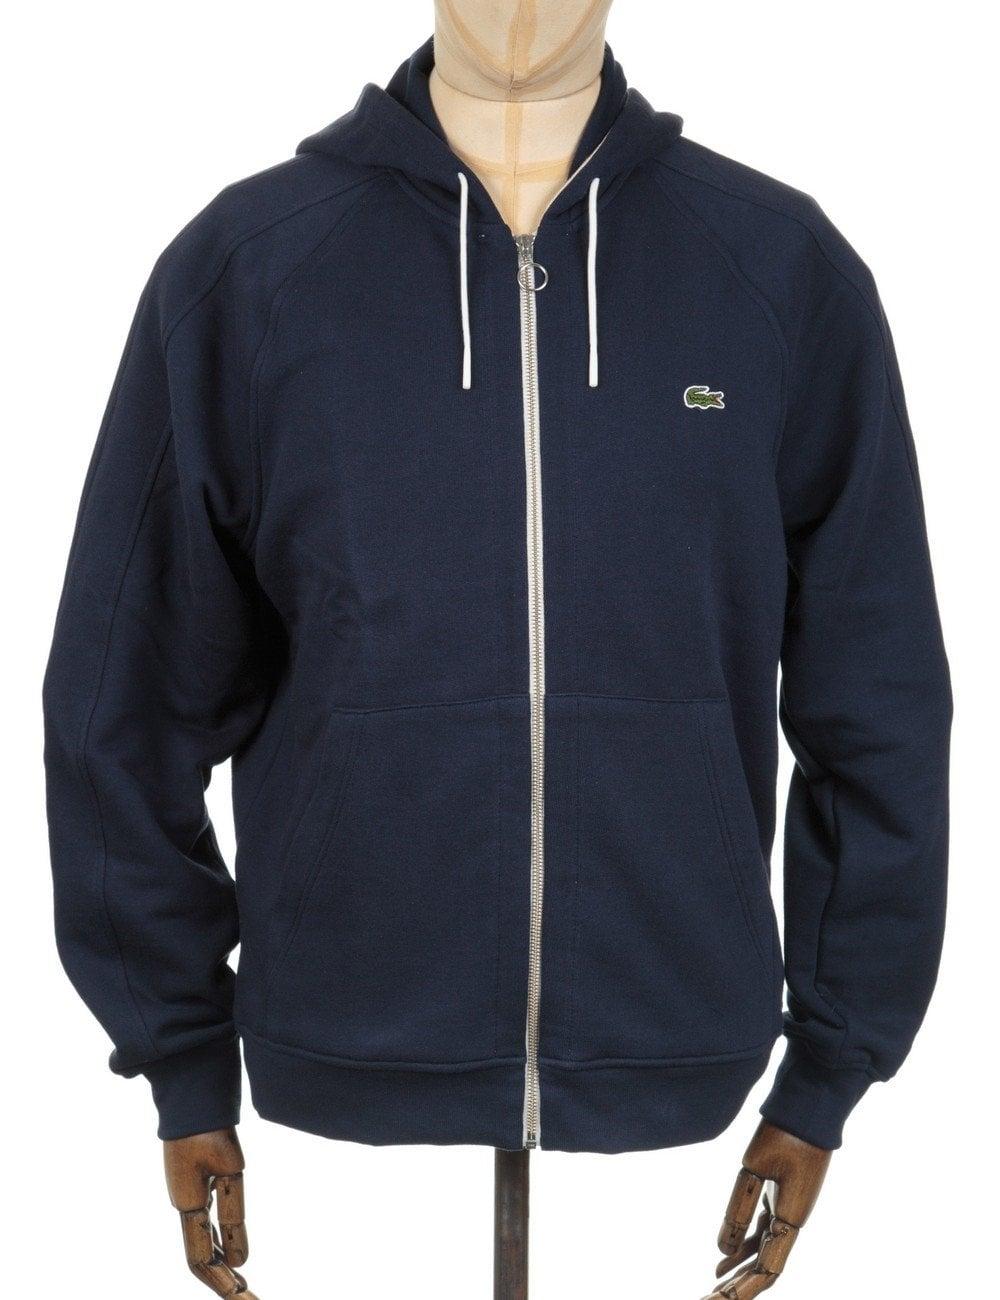 142aa2aaf394d Lacoste Live Zip Hooded Sweatshirt - Marine Blue - Clothing from Fat ...